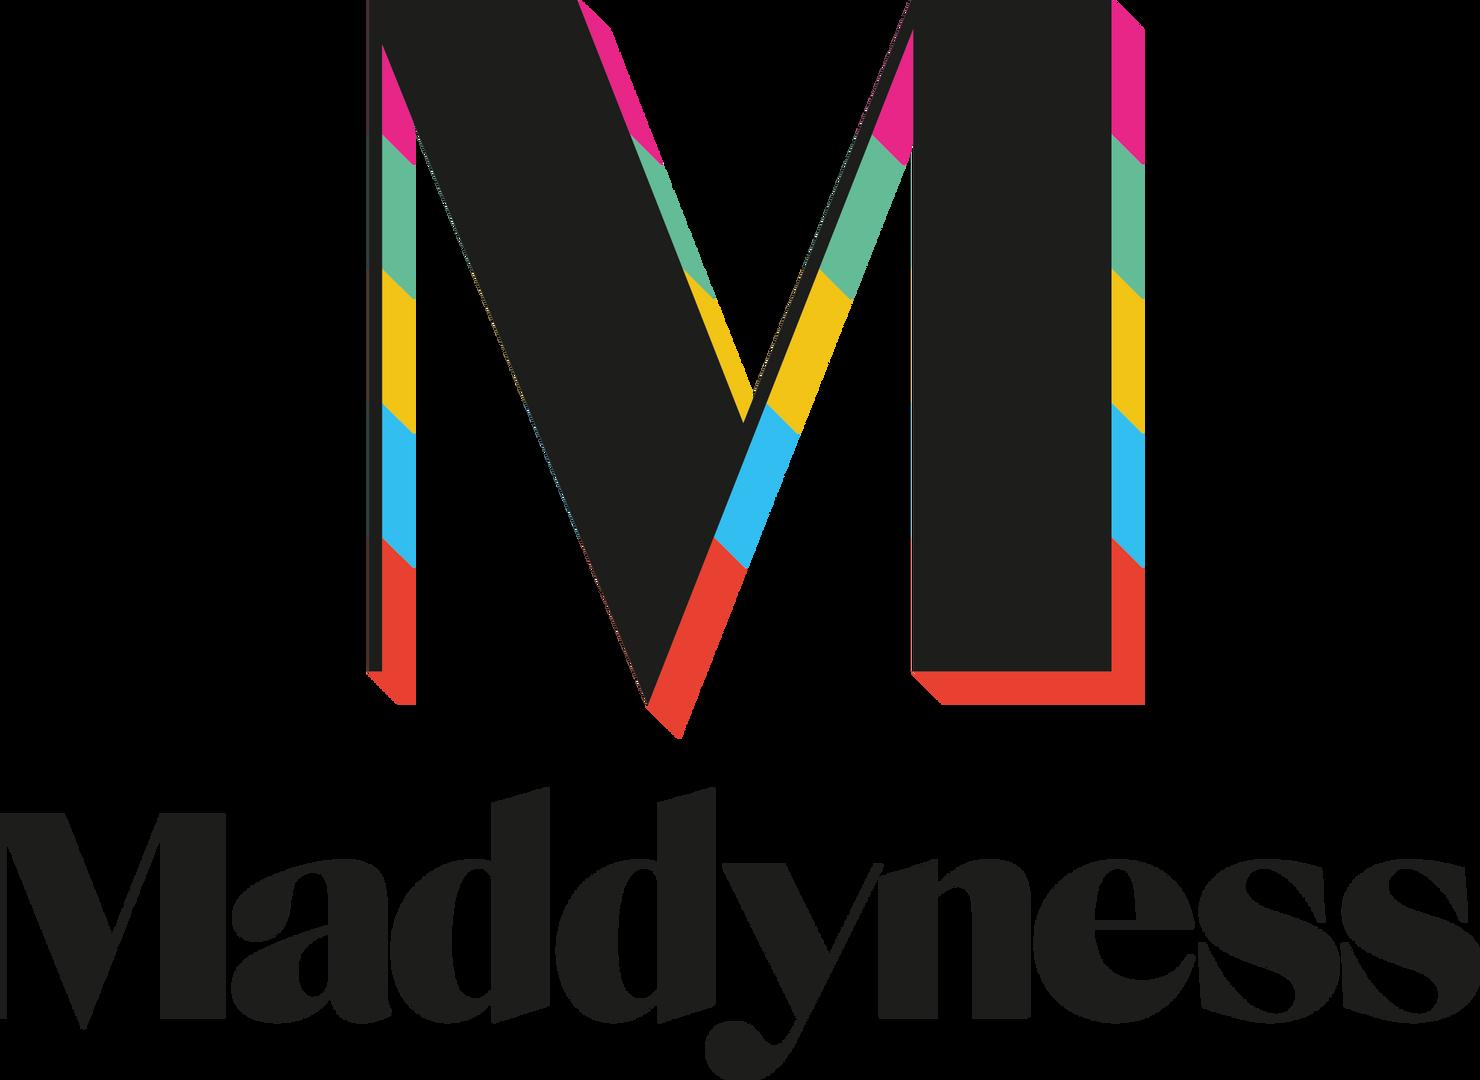 maddyness_logo-1.png